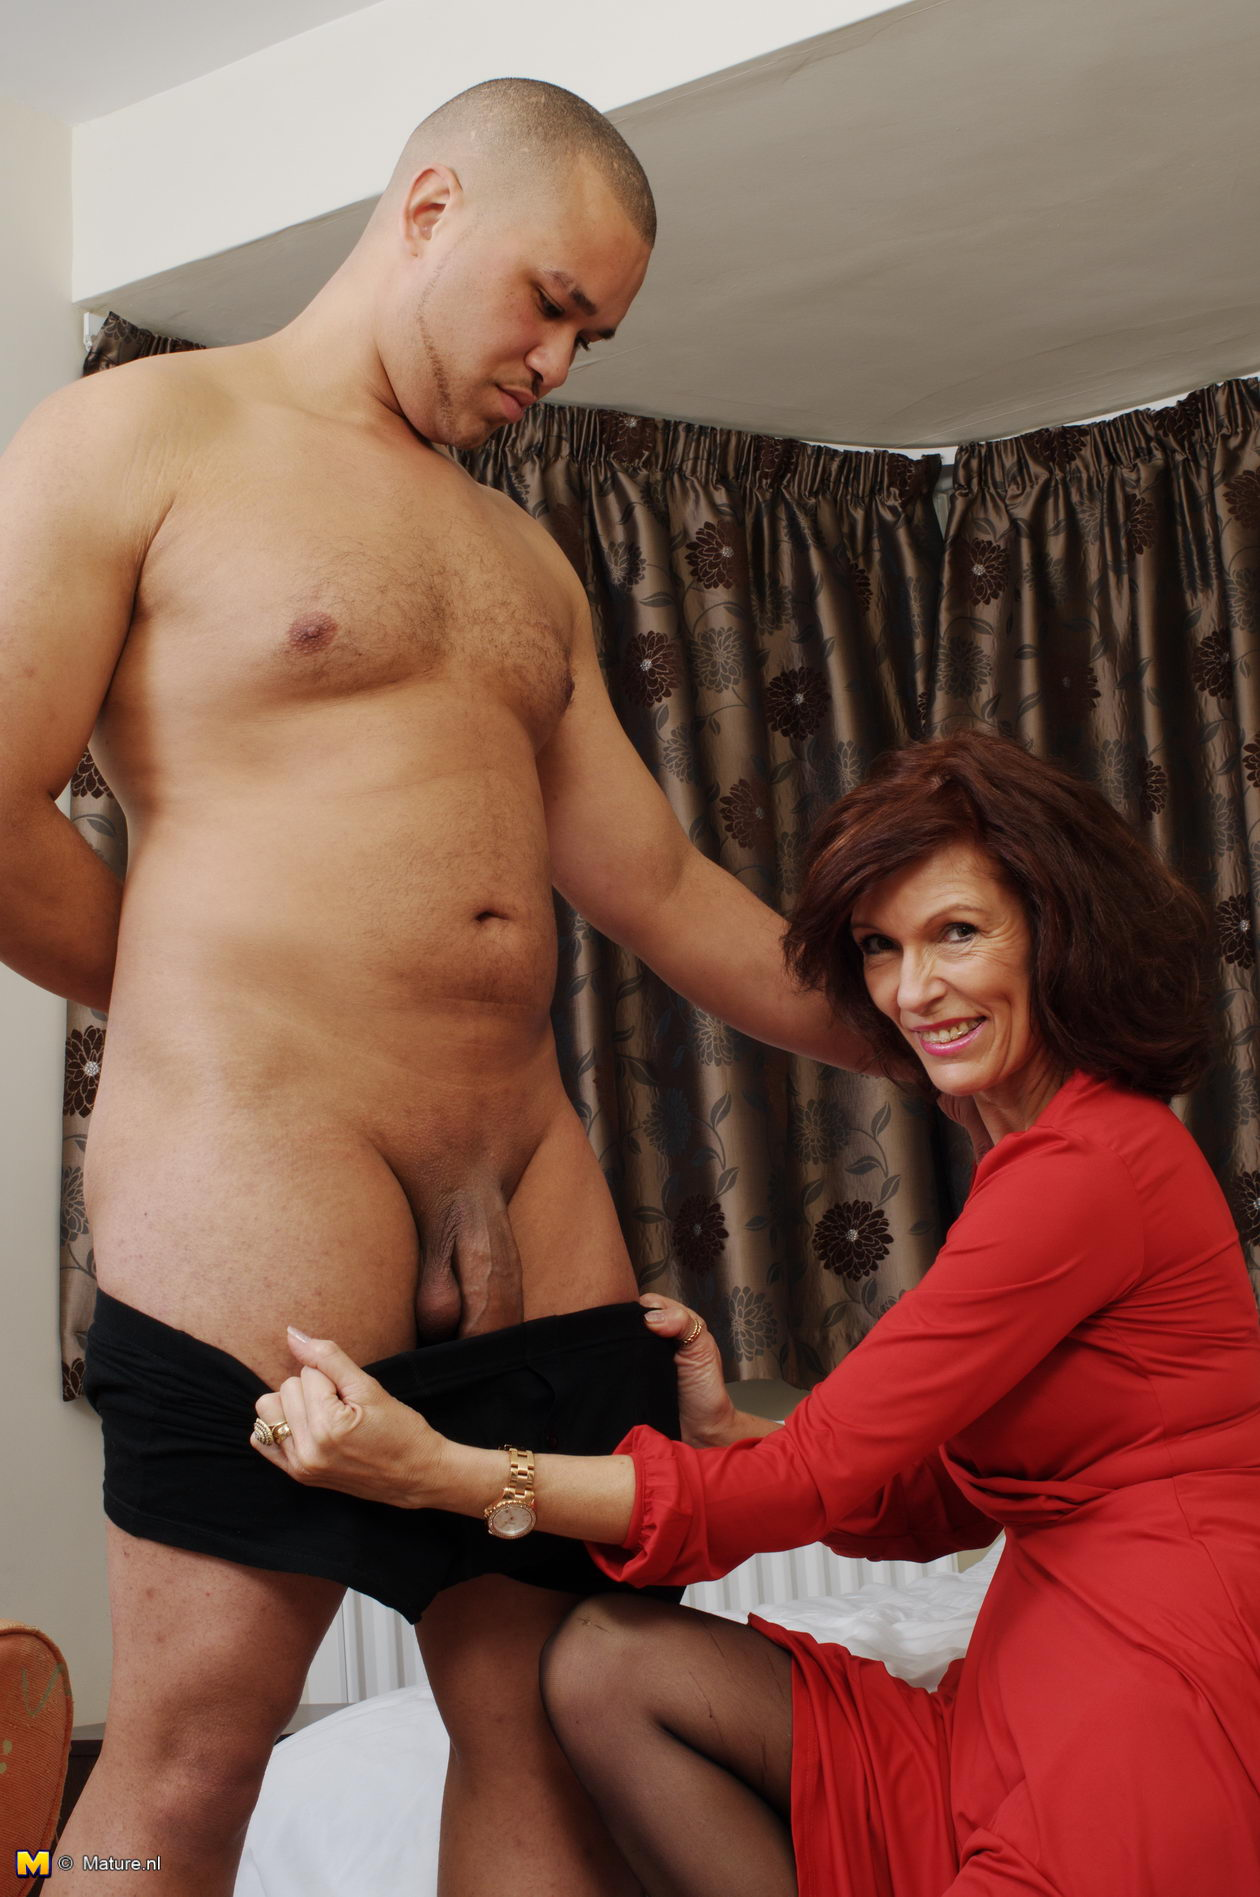 Sucking Dick Fitting Room